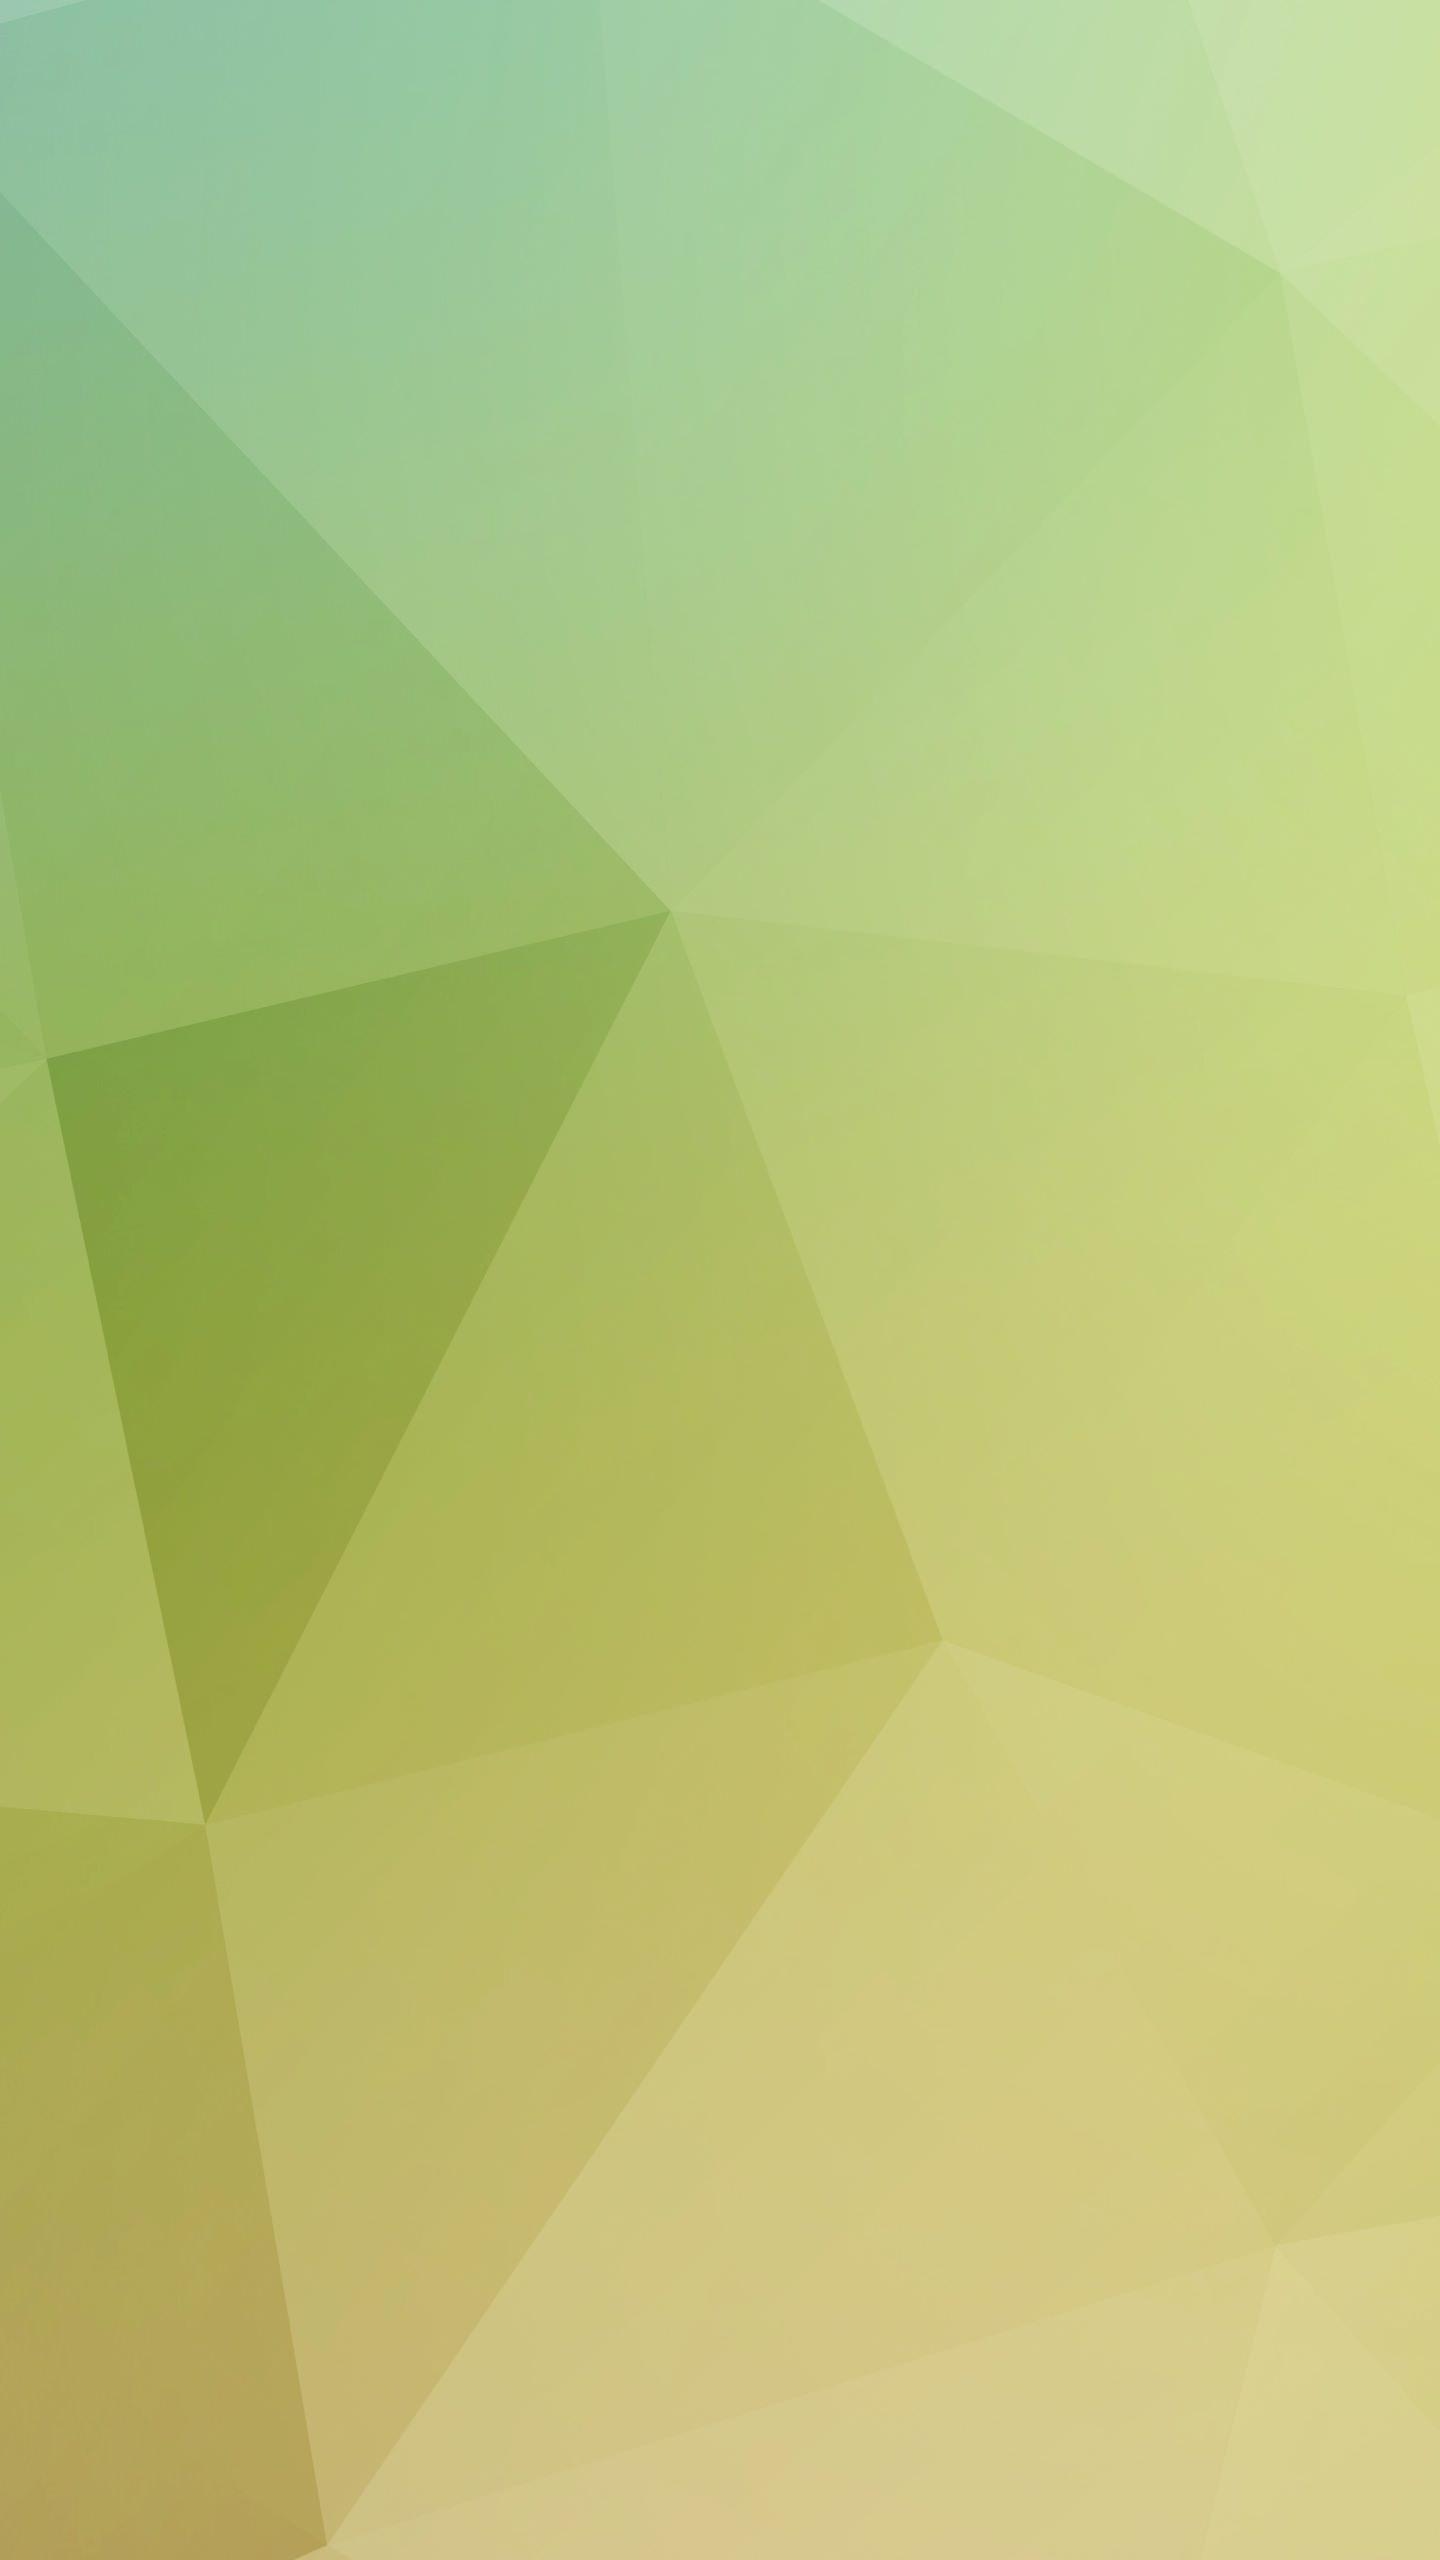 Pola kuning putih hijau  wallpapersc Android